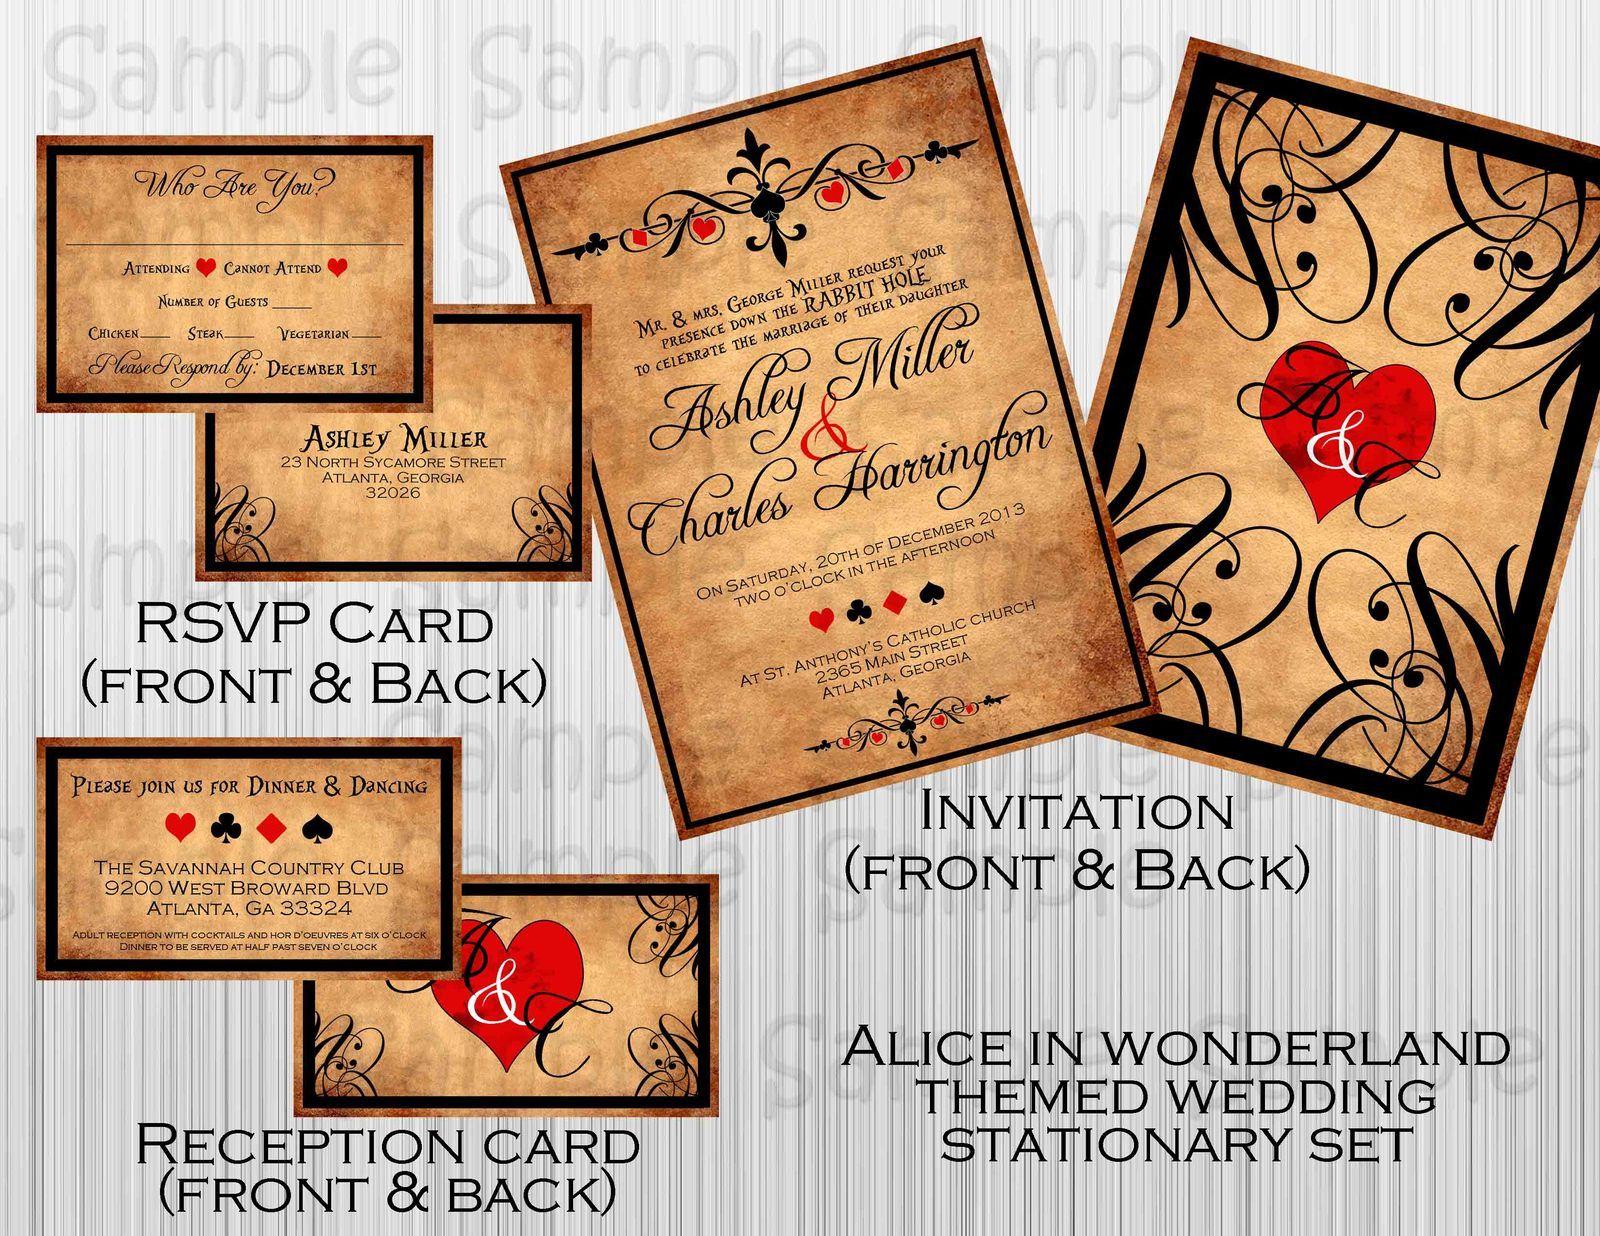 3 Alice in Wonderland Wedding Invitations  Wedding Invitation